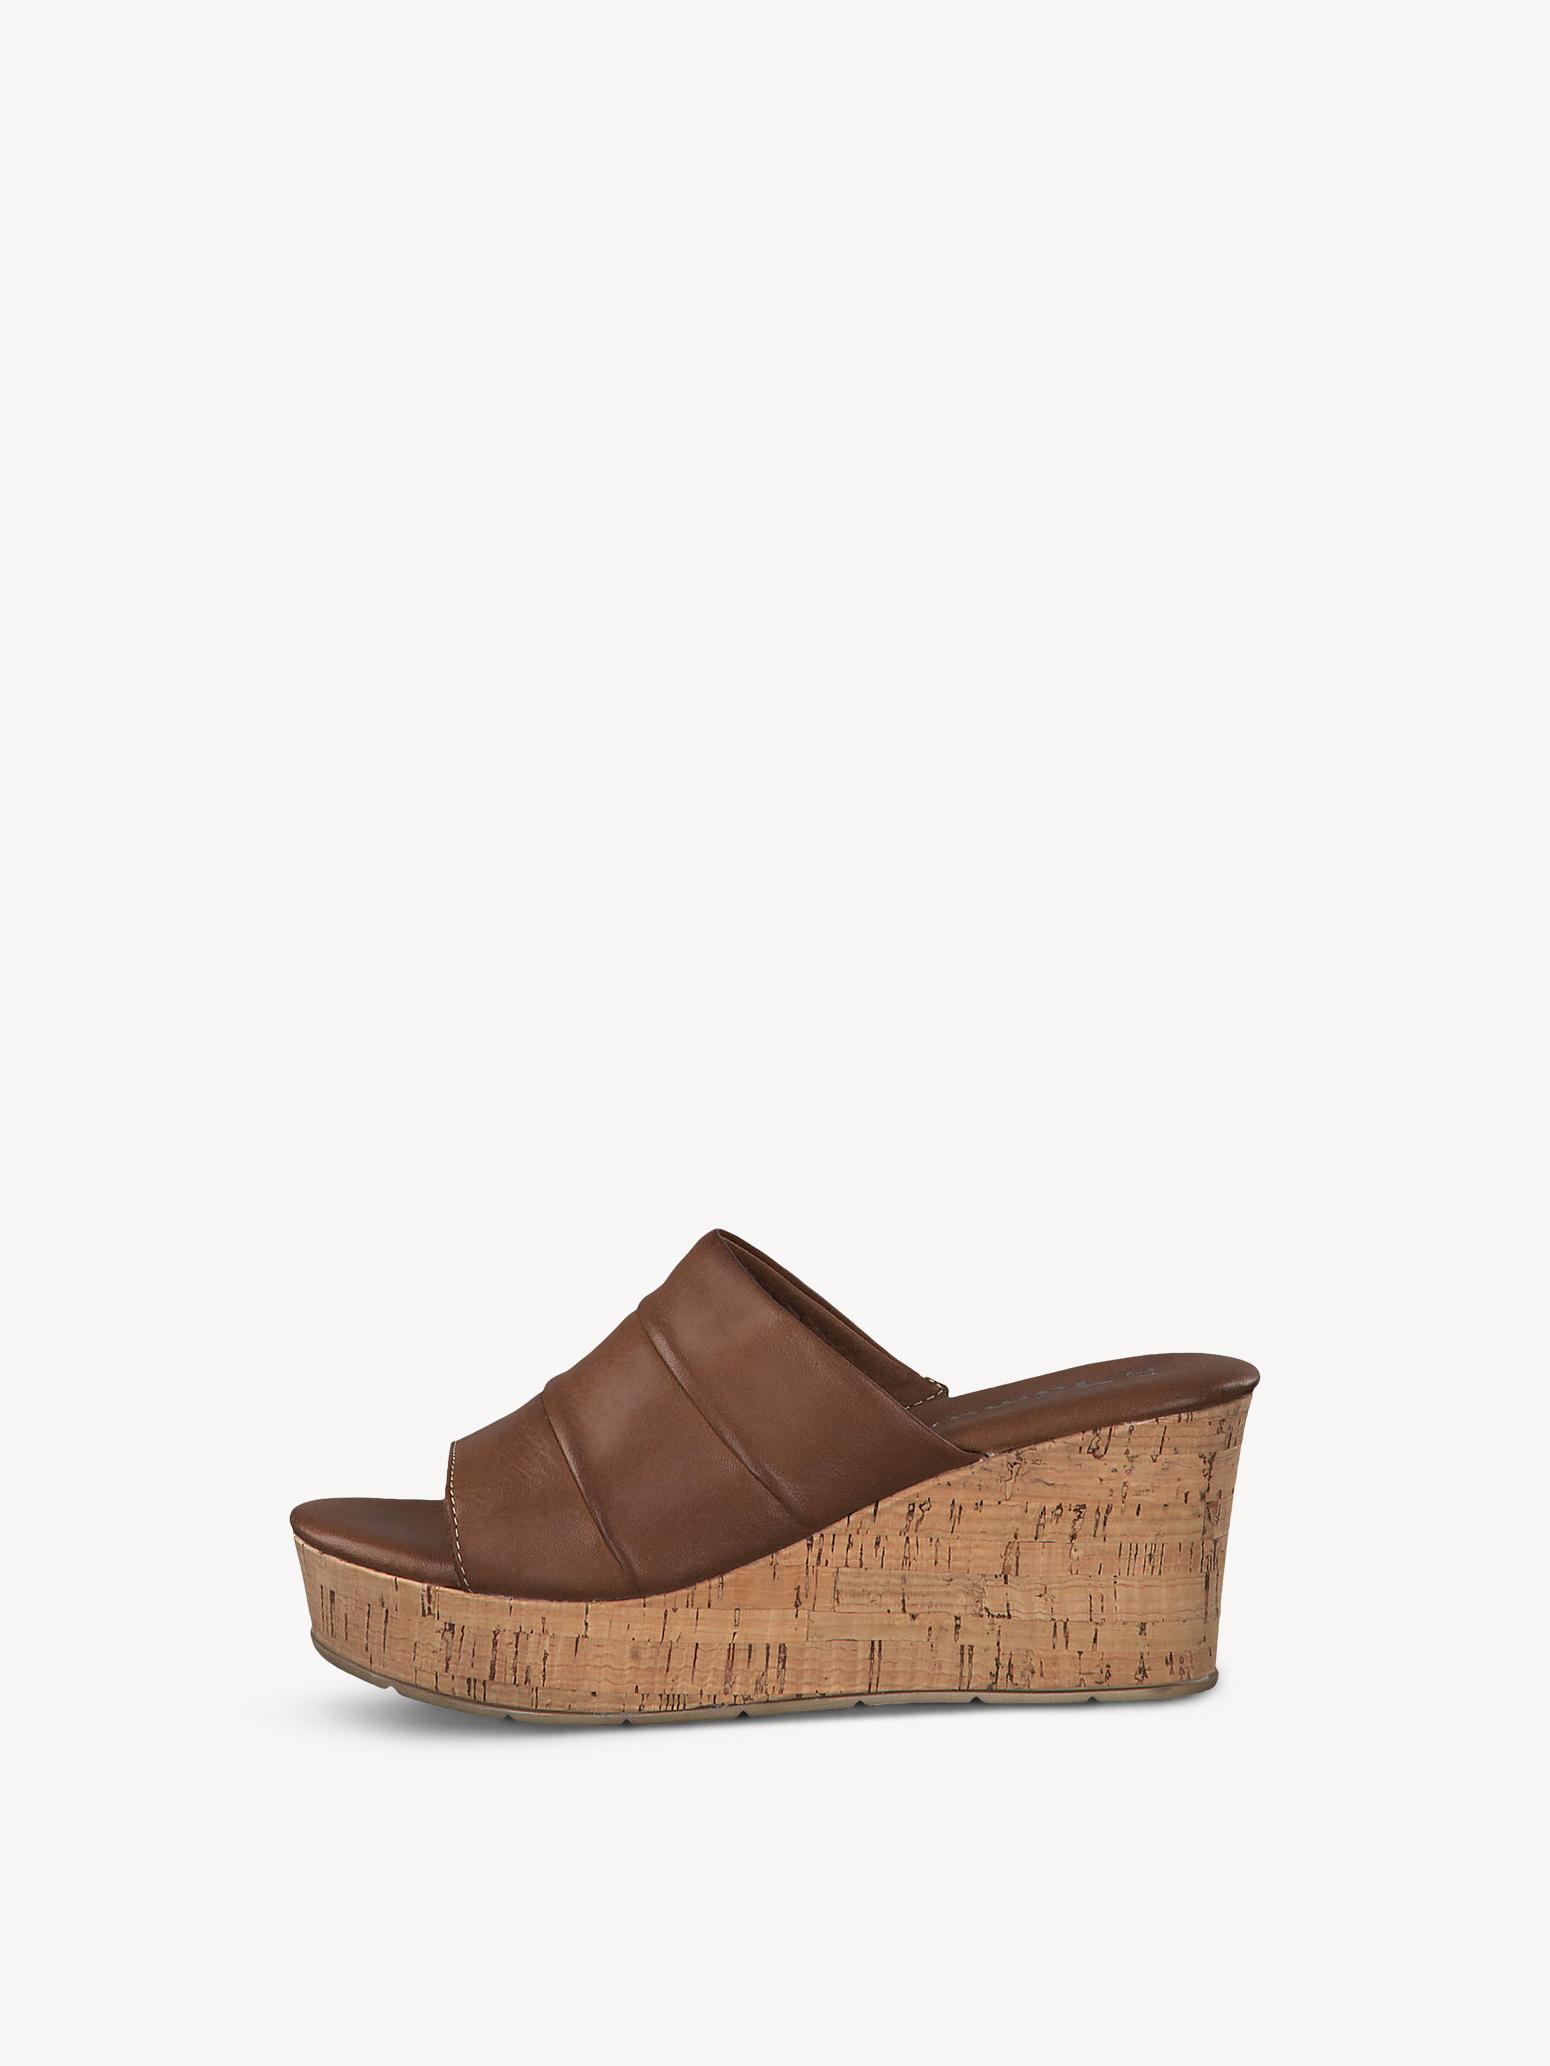 tamaris shoes buy online, Tamaris women's 1 1 27217 38001